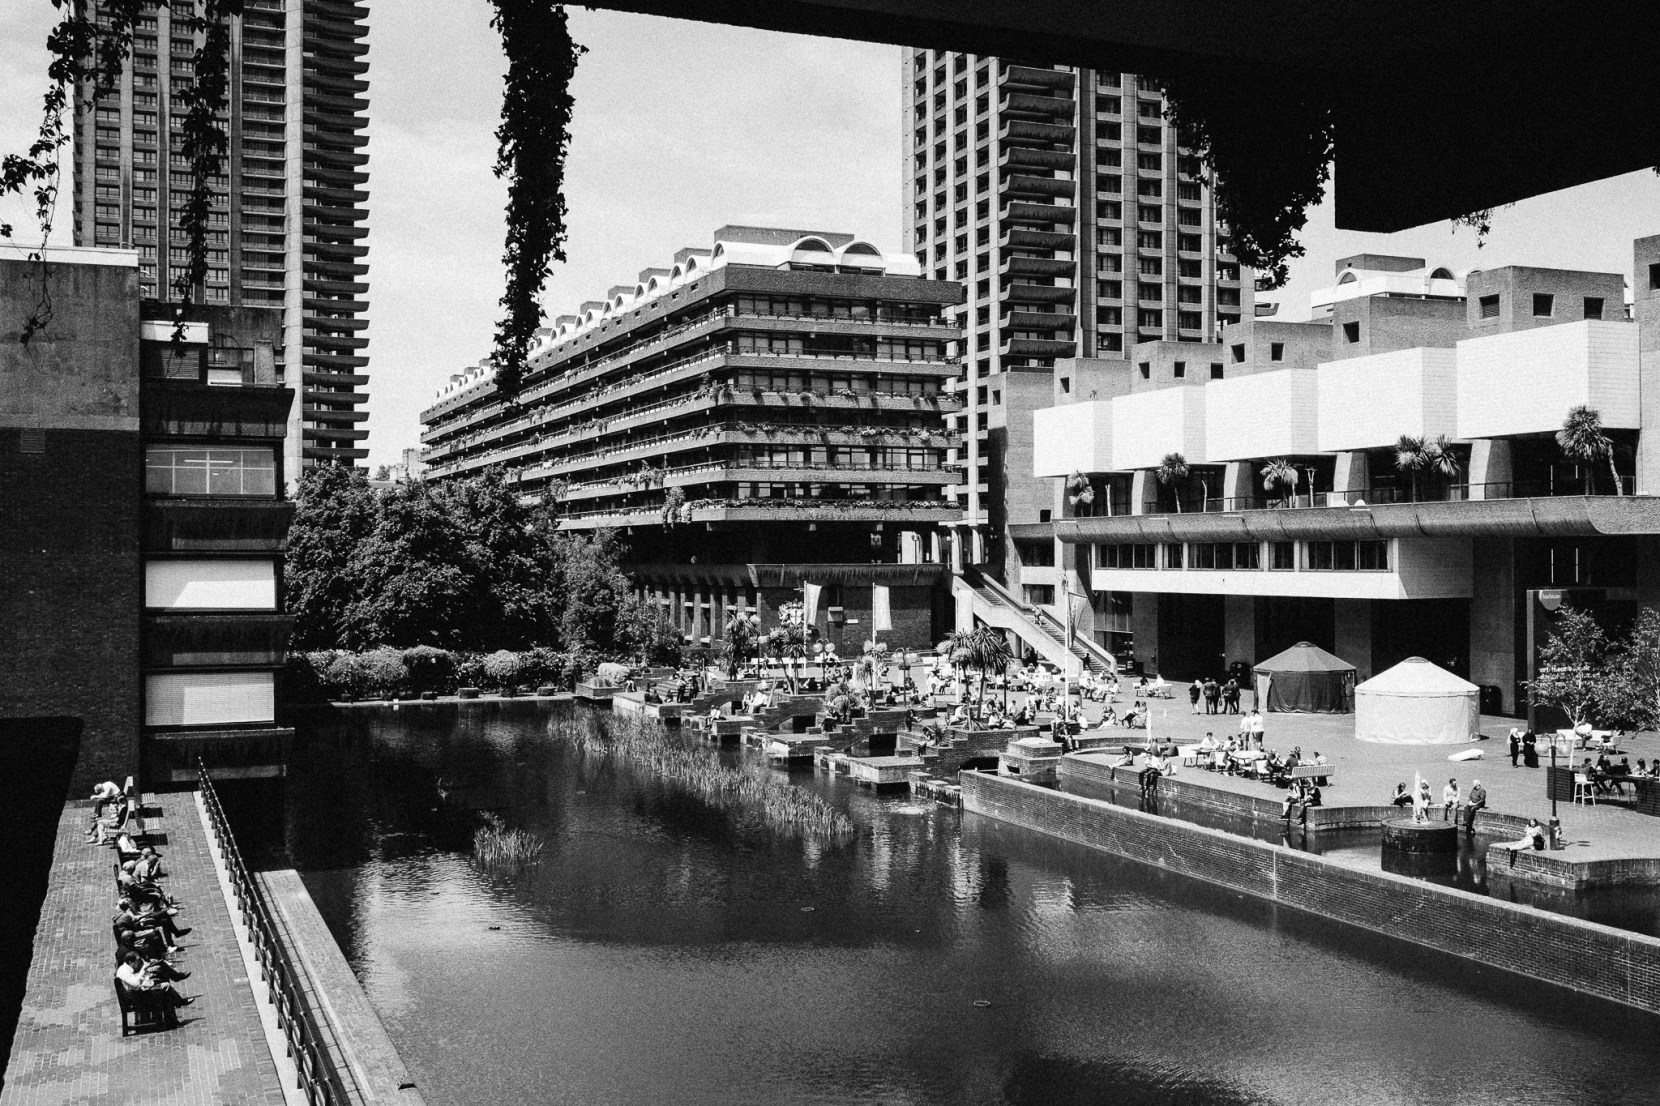 london-barbican-2081-pete-carr